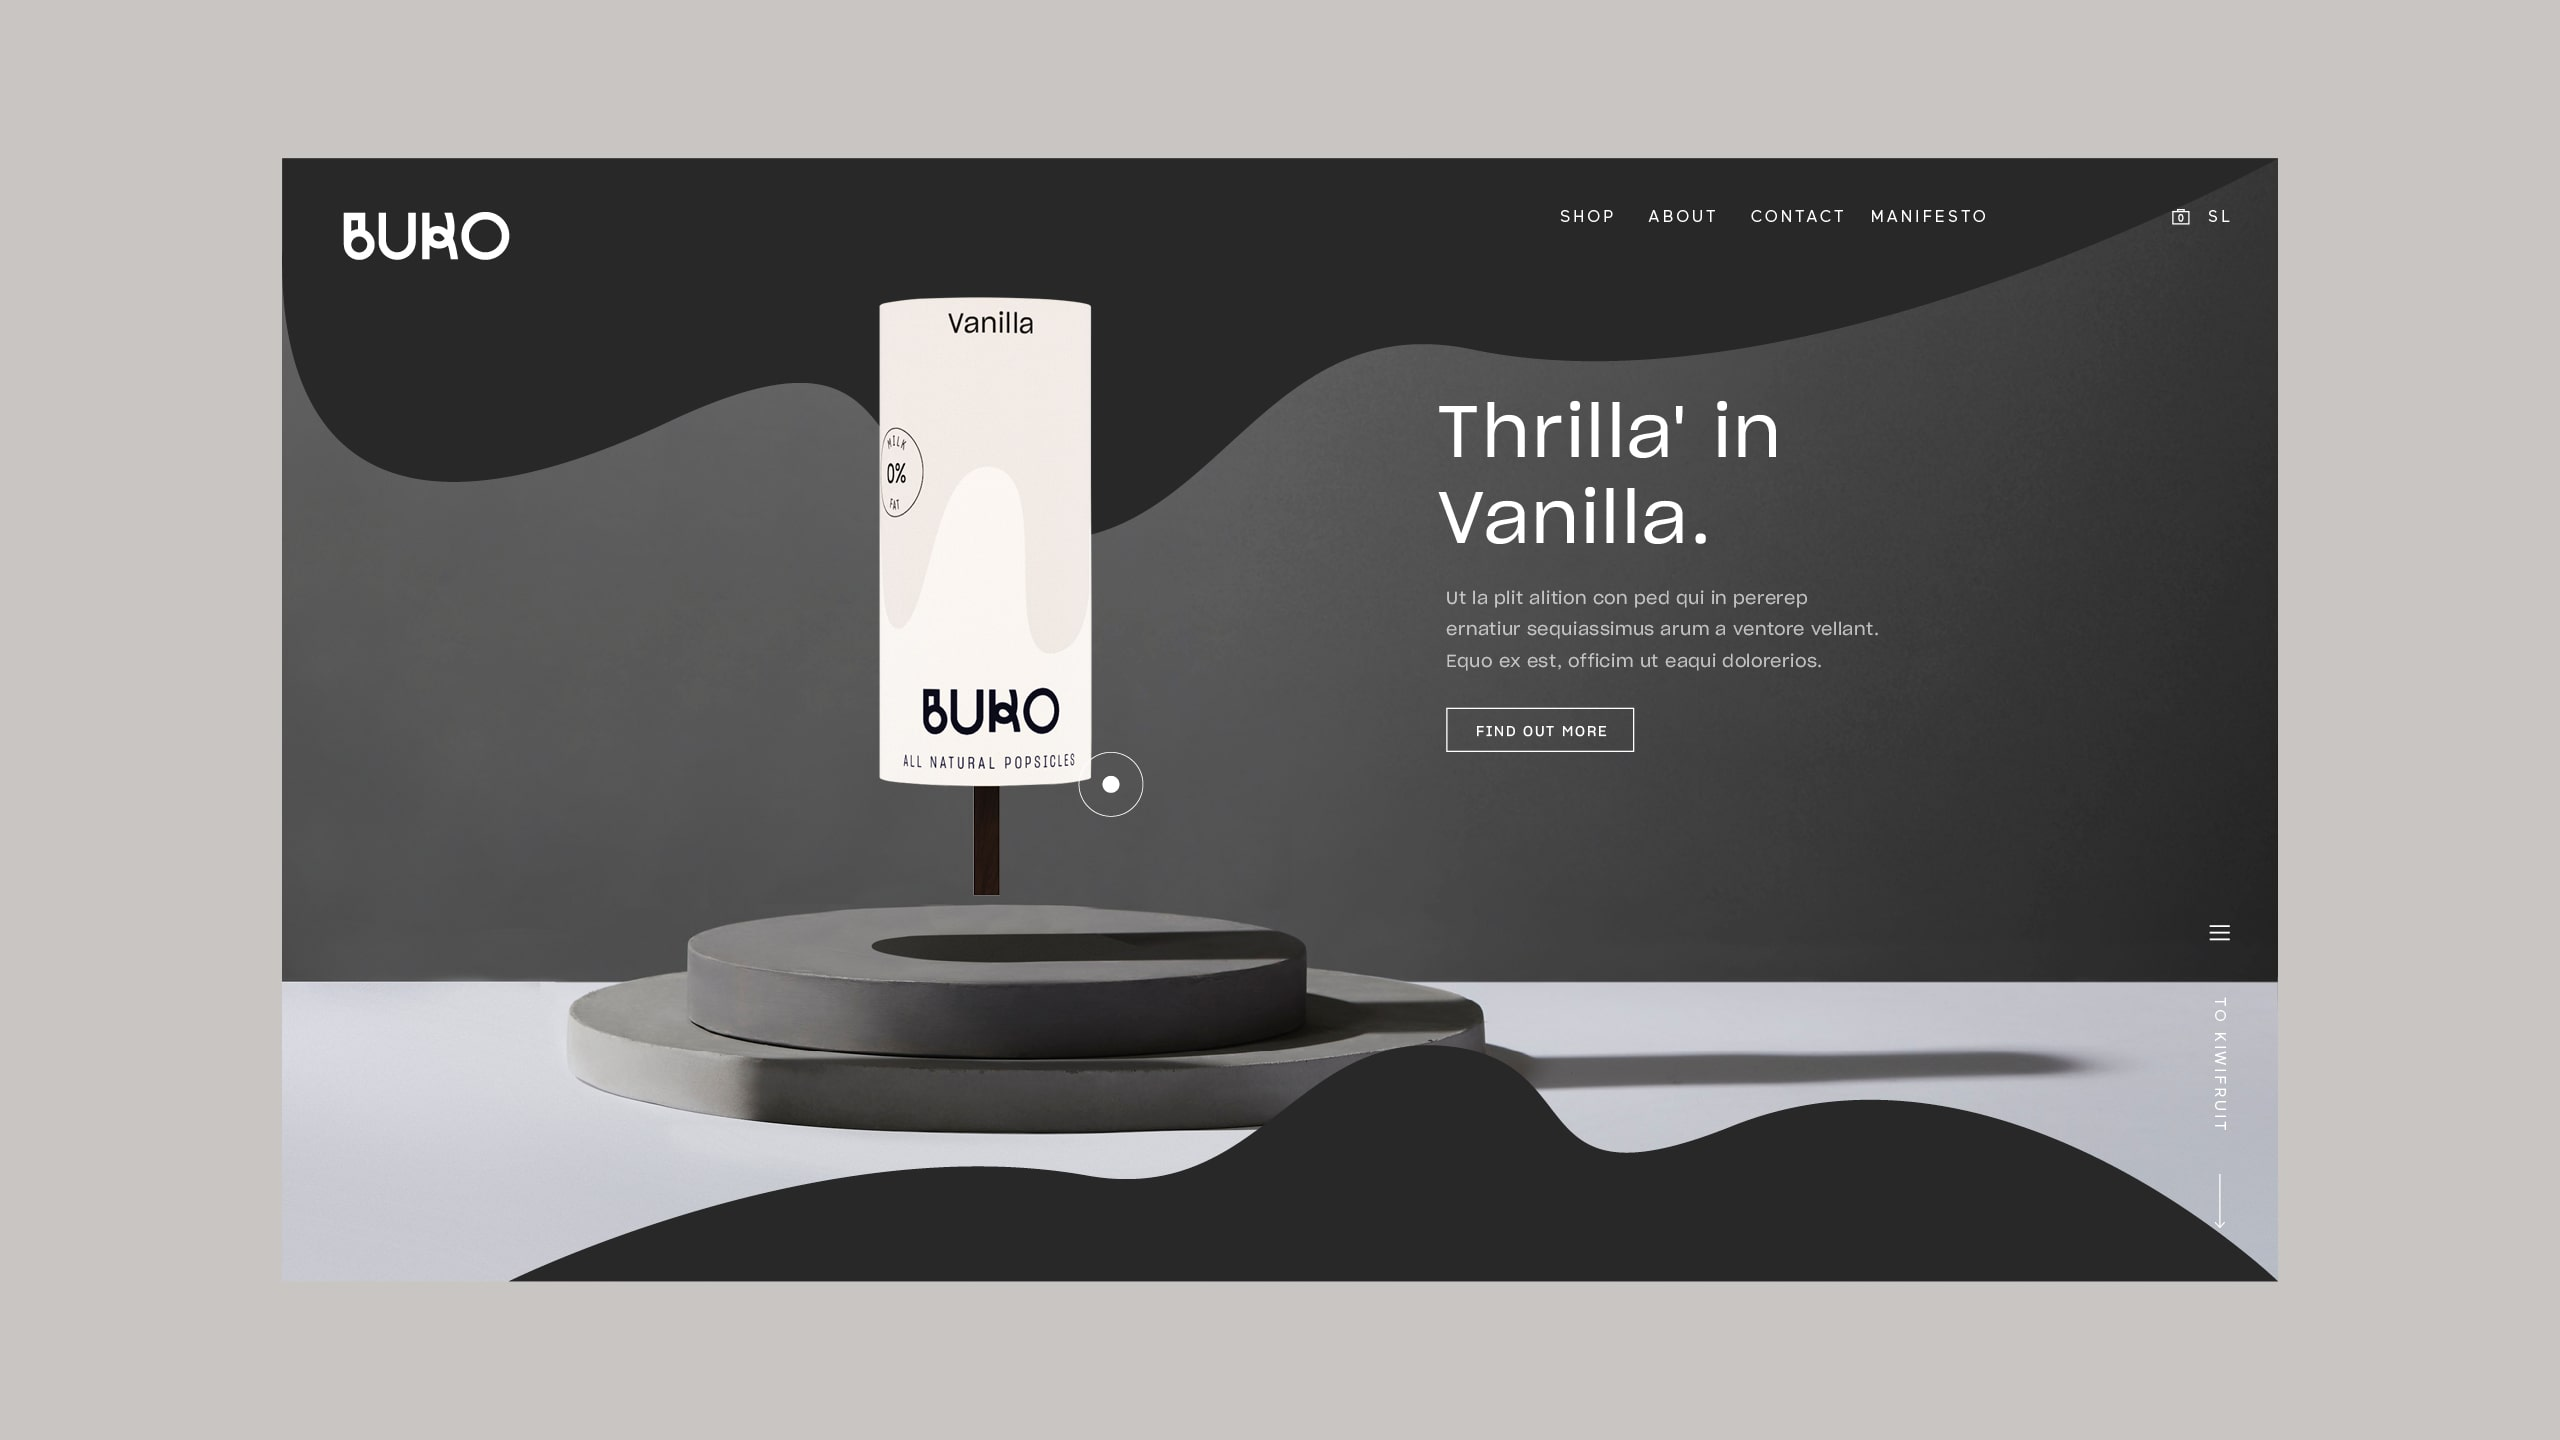 mantik-digital-creative-agency-branding-popsicle-icecream-packaging-experience-web-design-development10-min